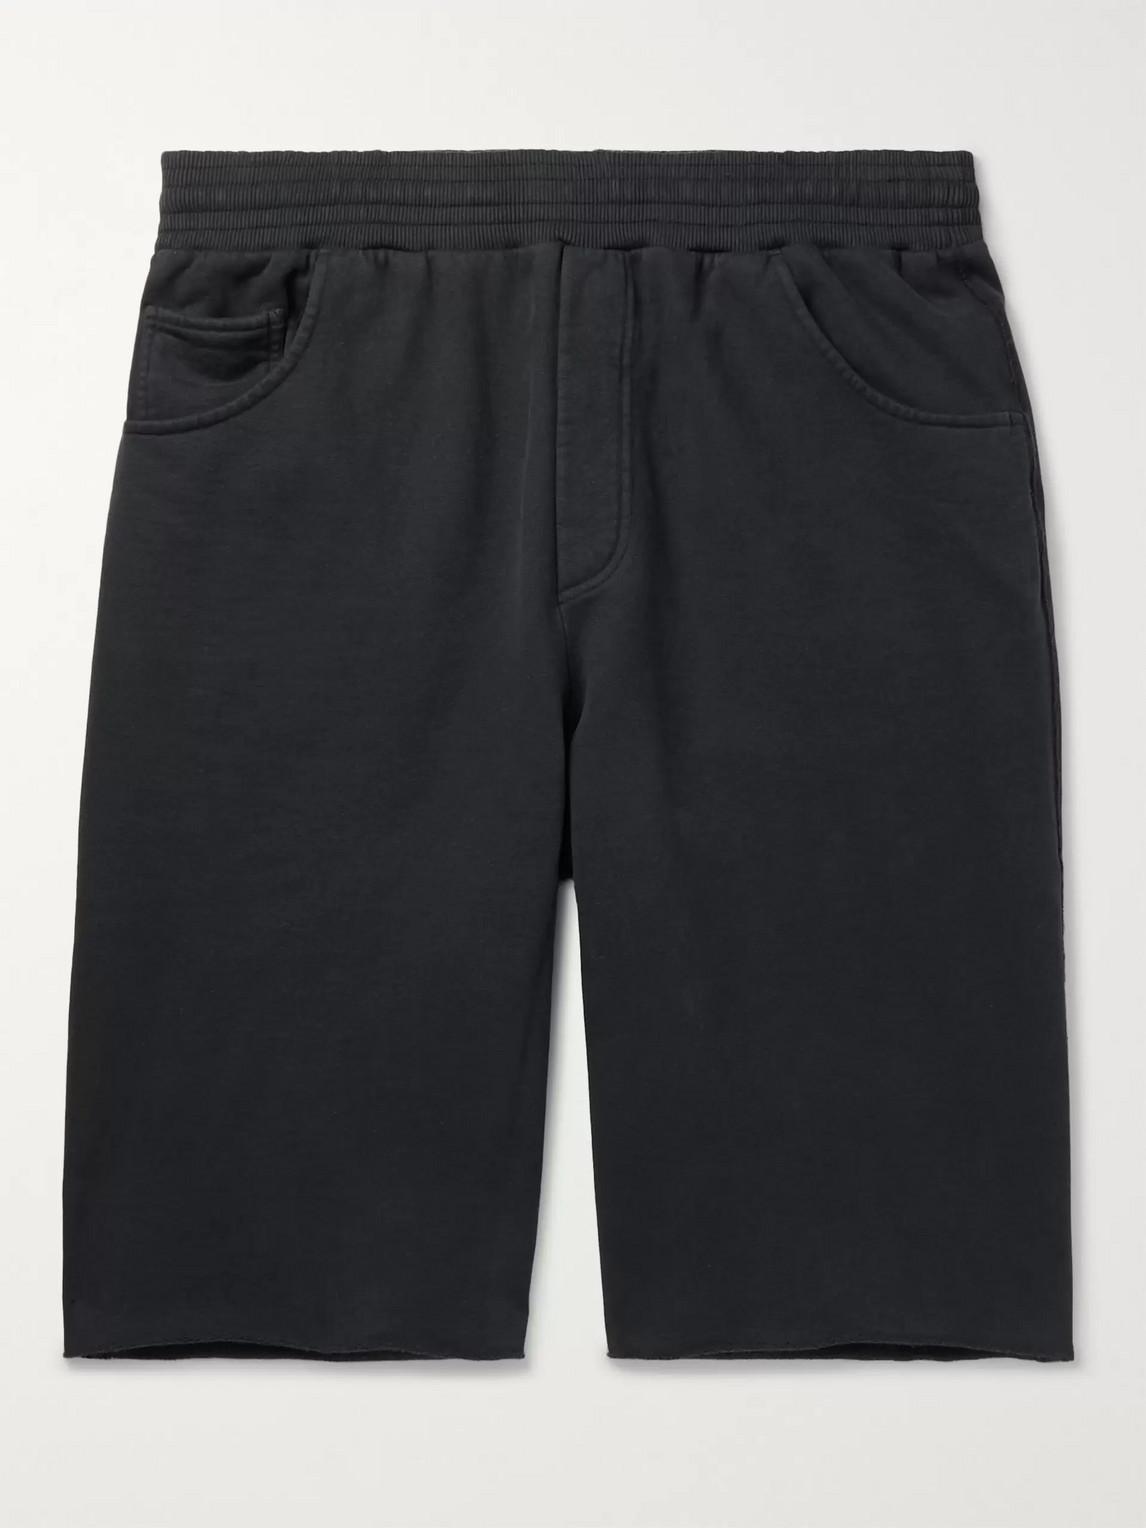 acne studios - wide-leg fleece-back cotton-jersey shorts - men - black